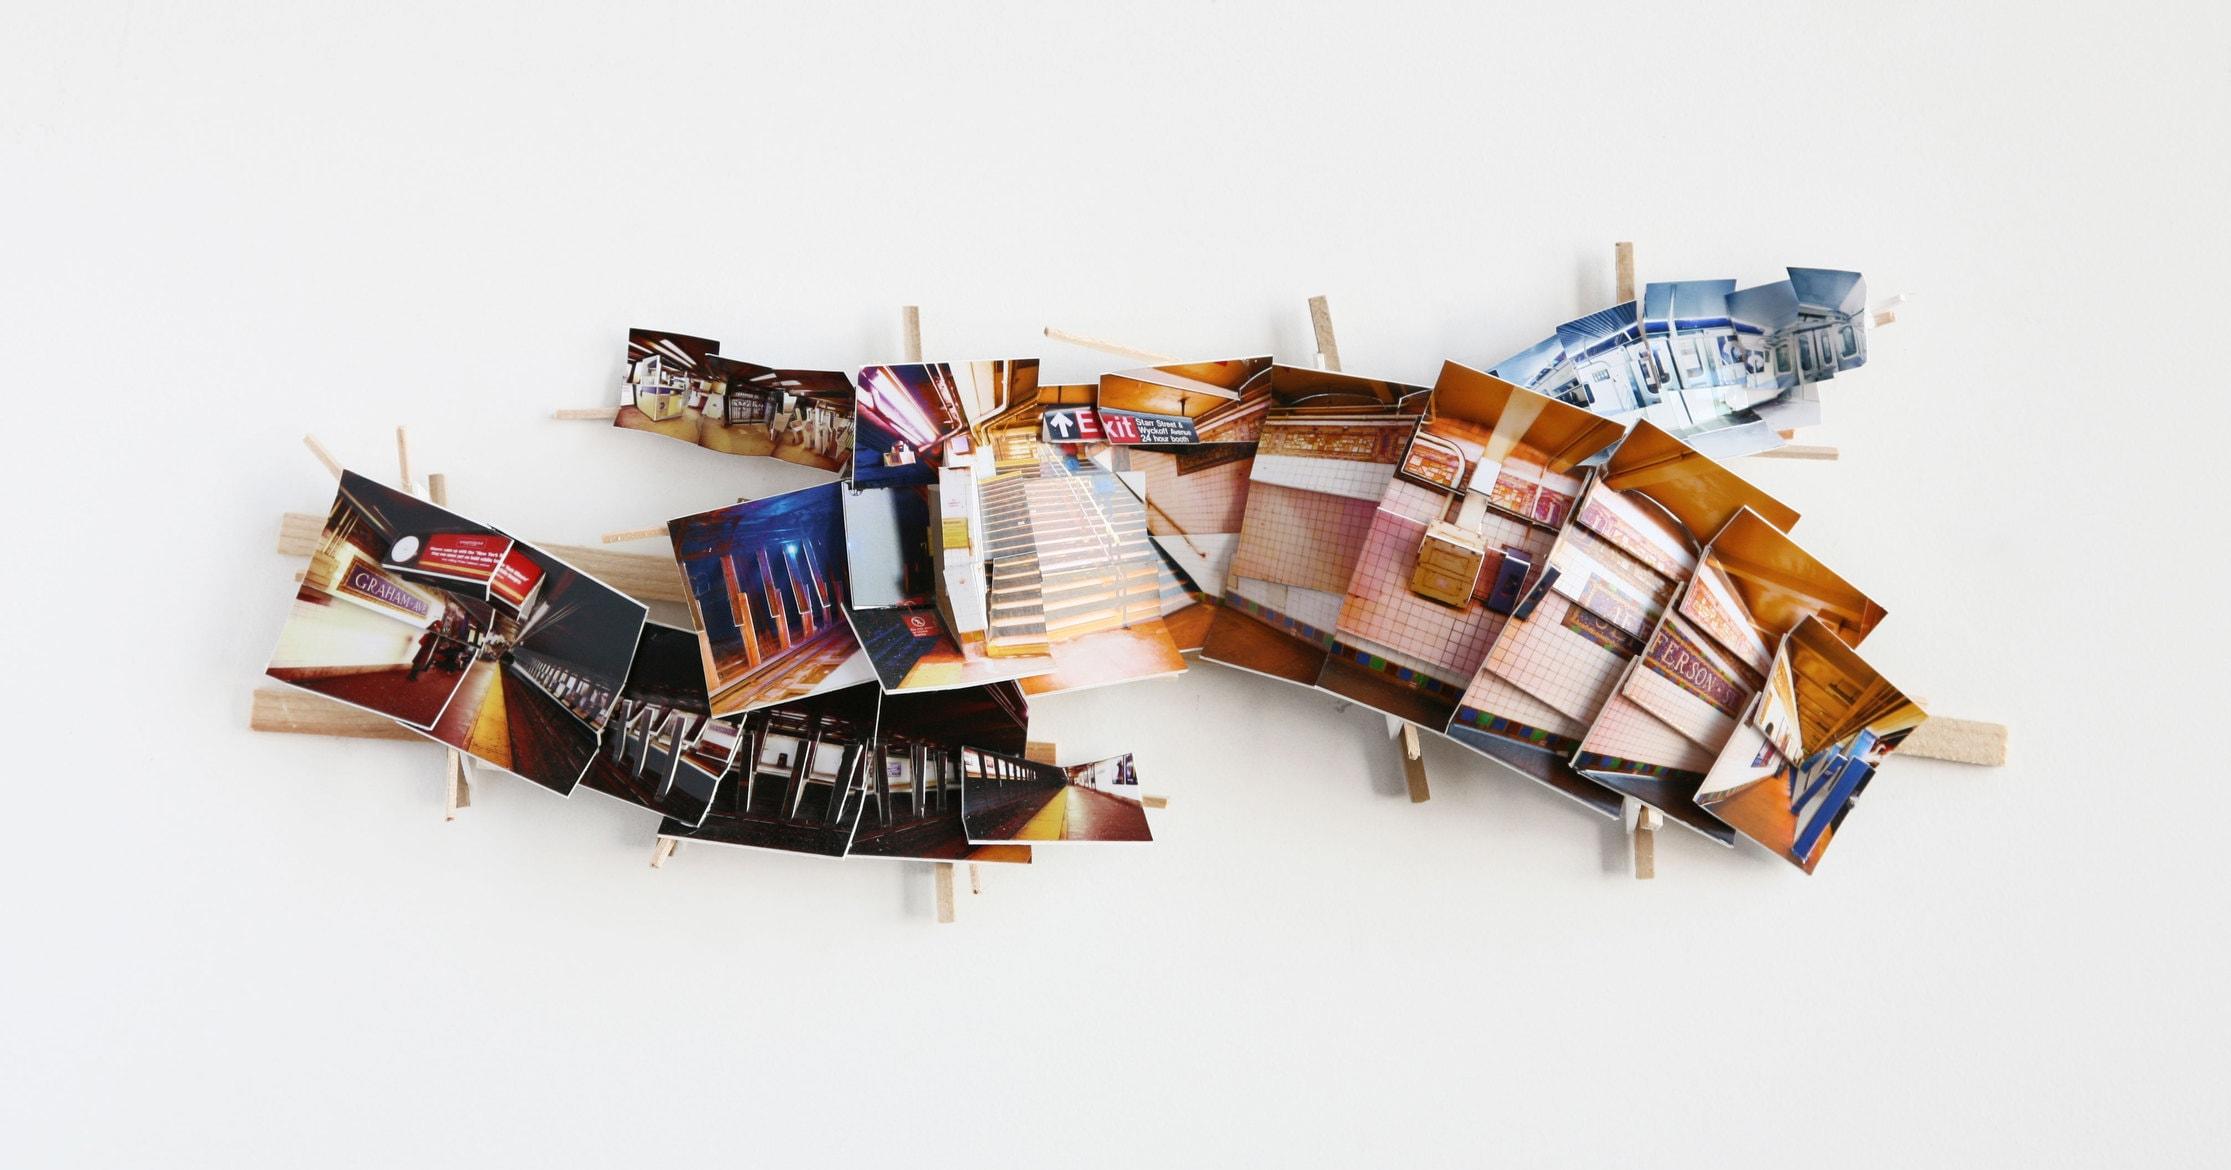 'Model 1', 2016, C-print, wood, museum board, 48 x 20 x 5 cm